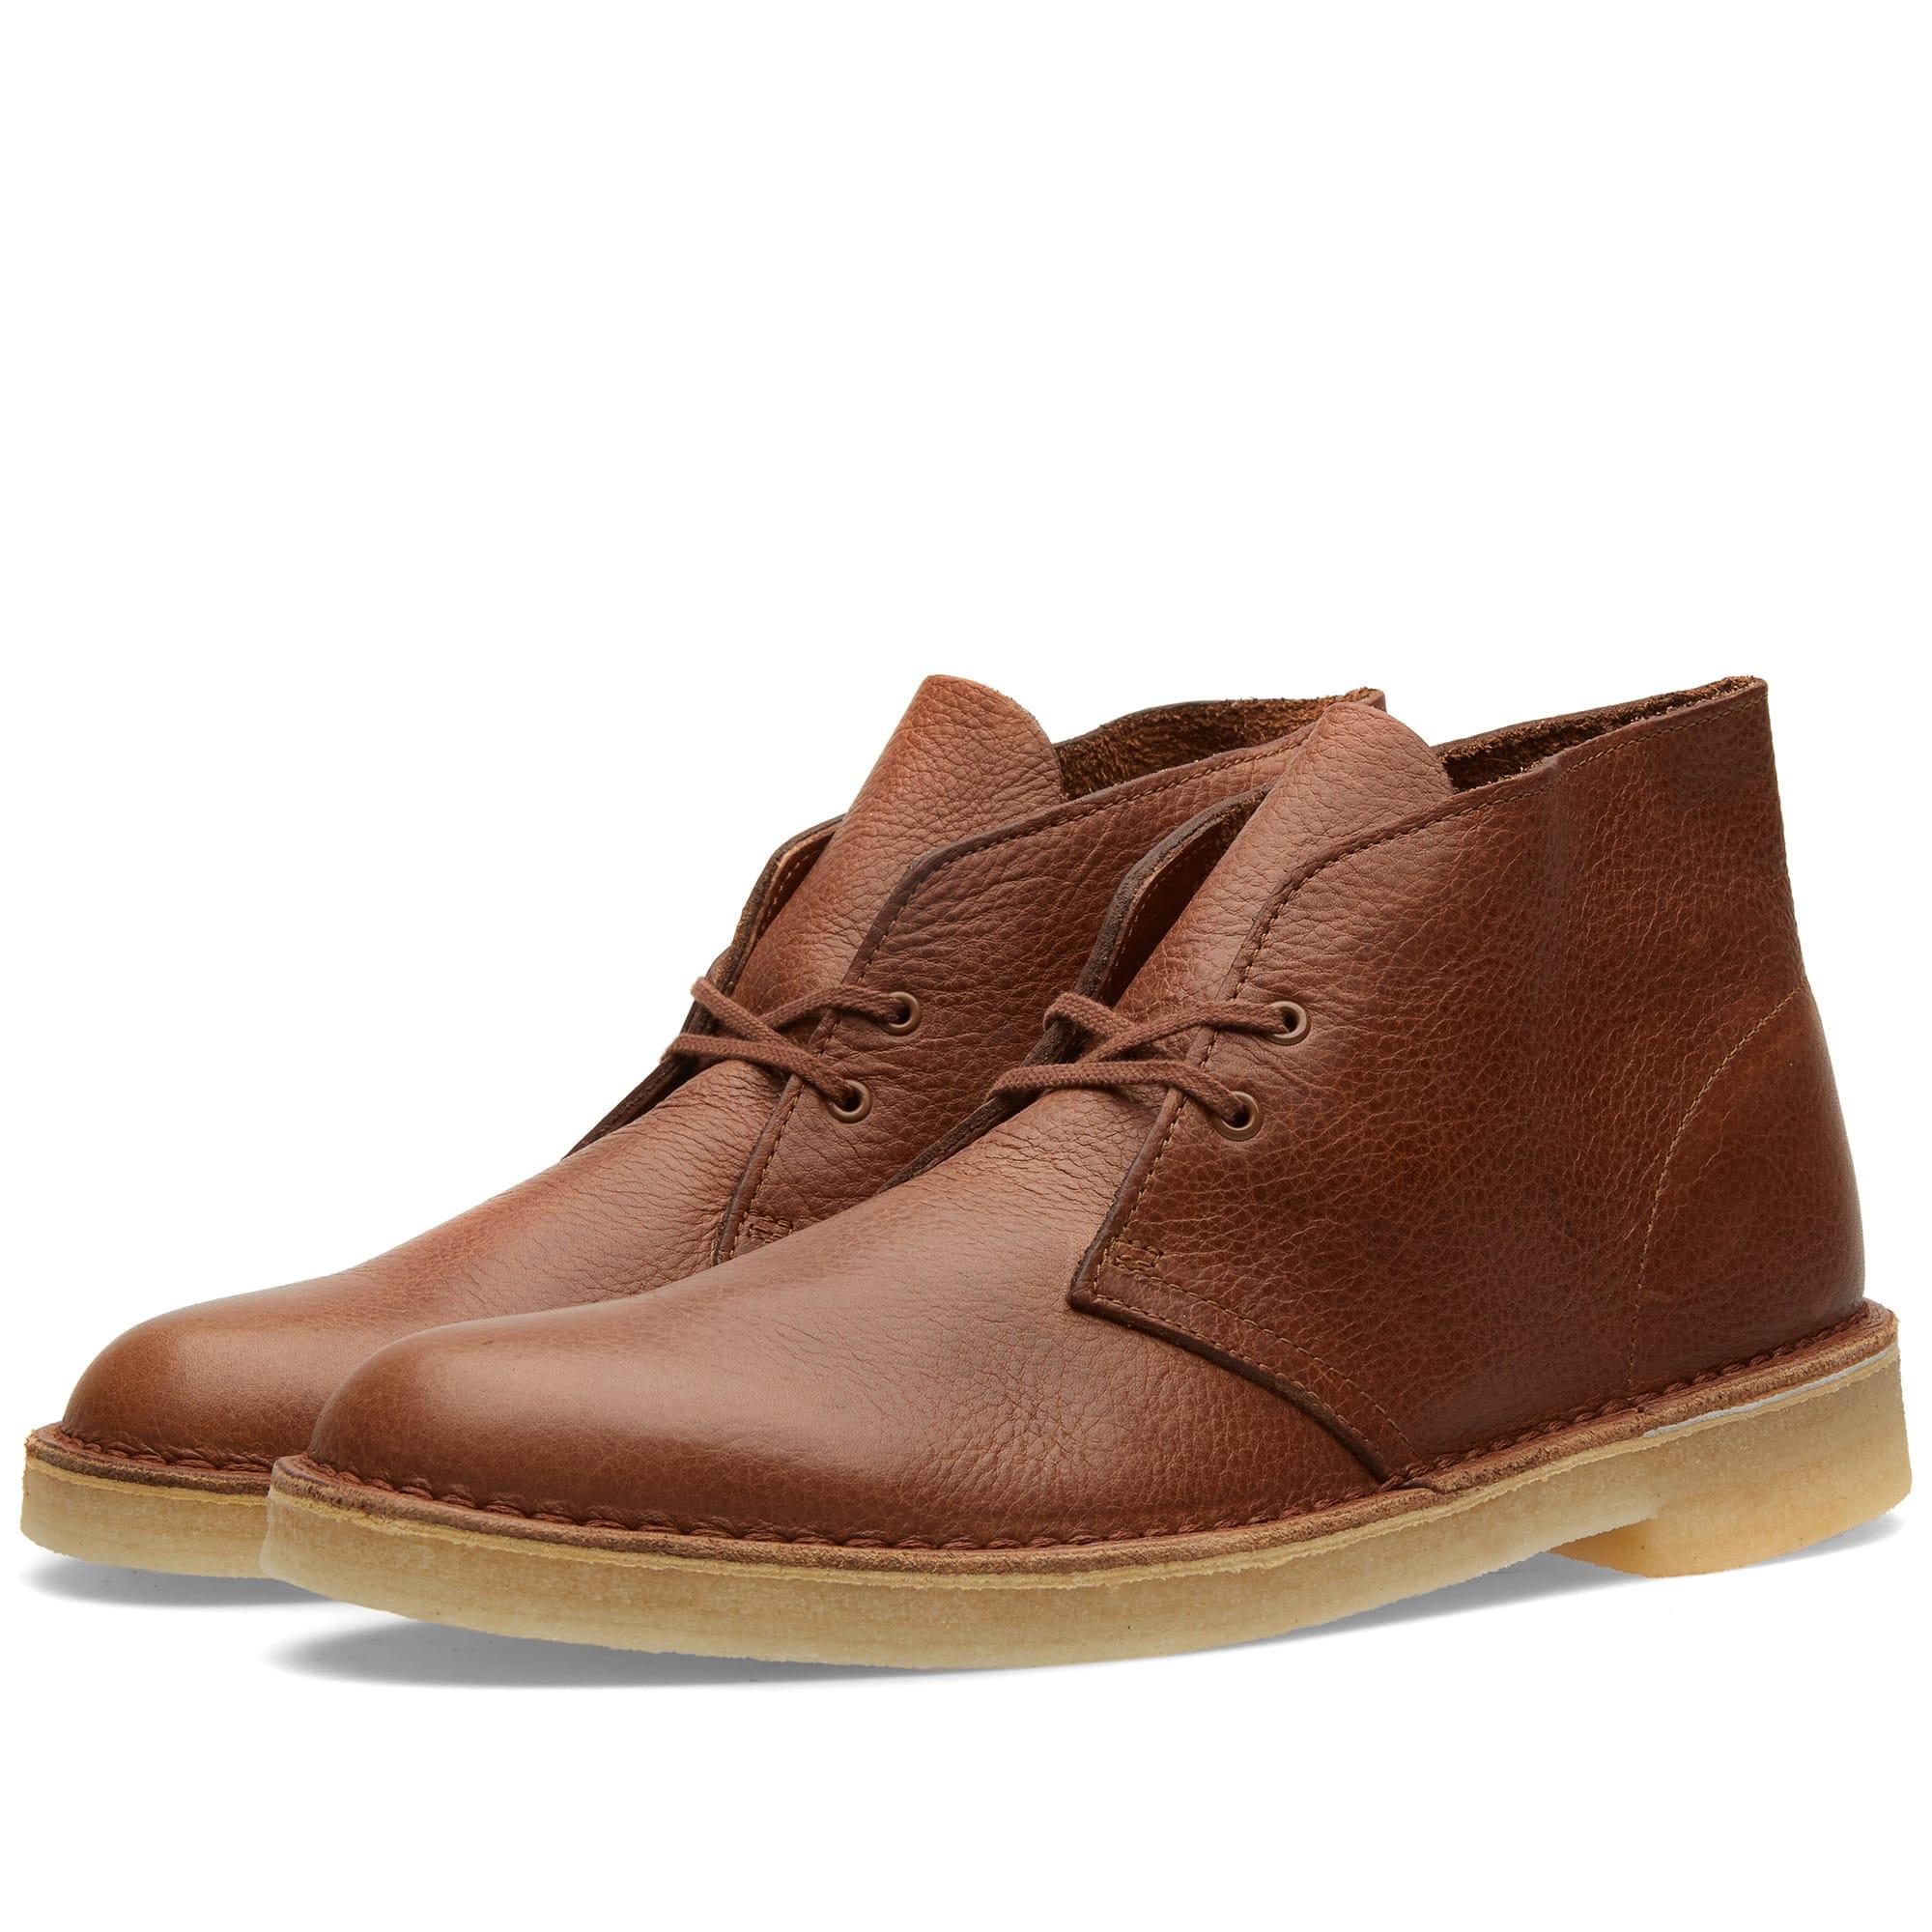 clarks originals desert boot tan tumbled leather. Black Bedroom Furniture Sets. Home Design Ideas